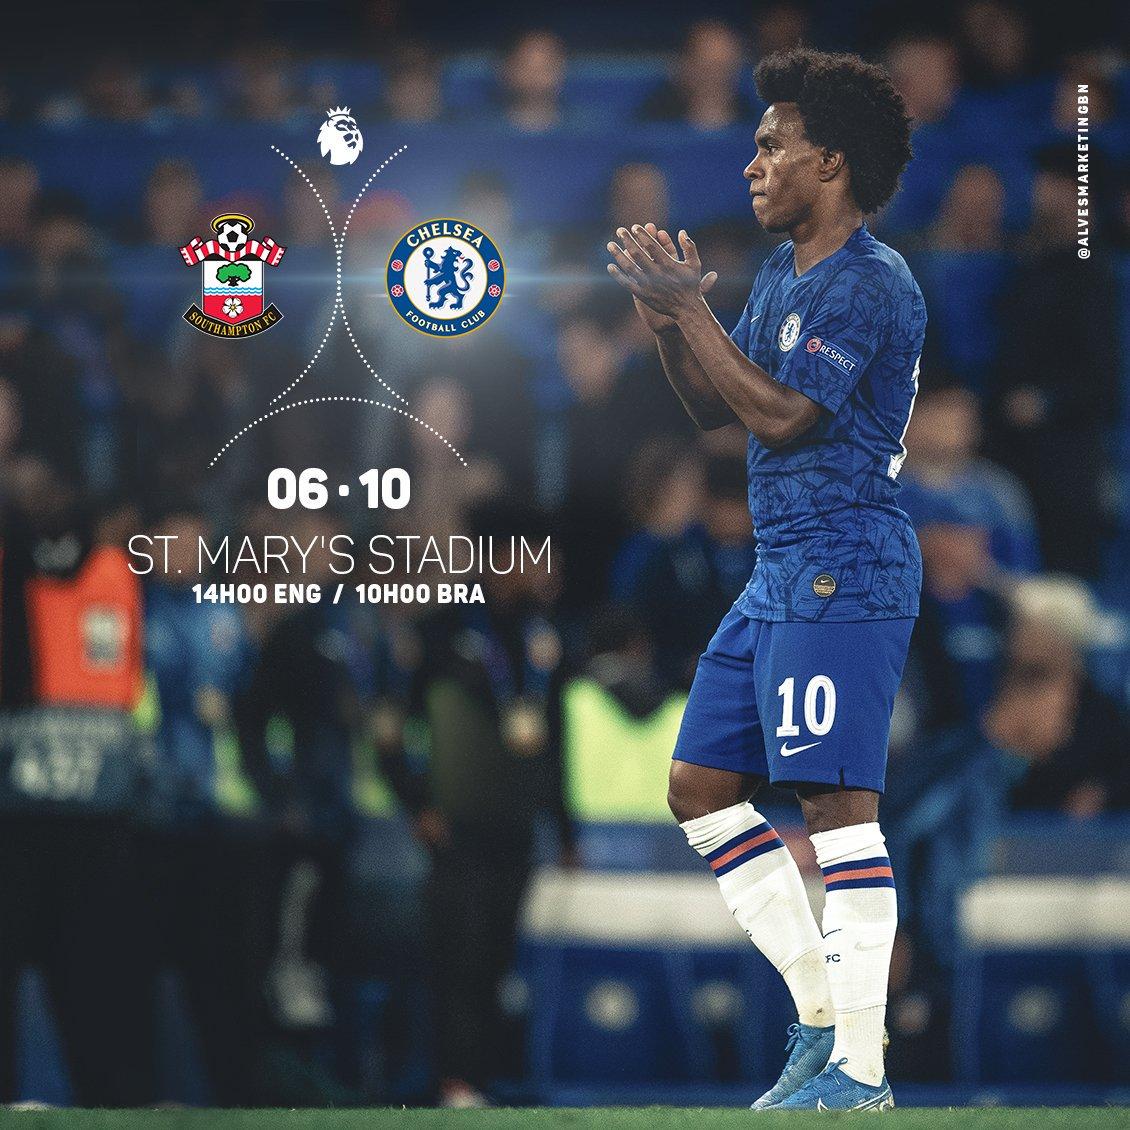 Come on Chelsea!!! 💪🏿⚽️💙#CFC #premierleague #matchday #W10 #comeonchelsea #vamoschelsea